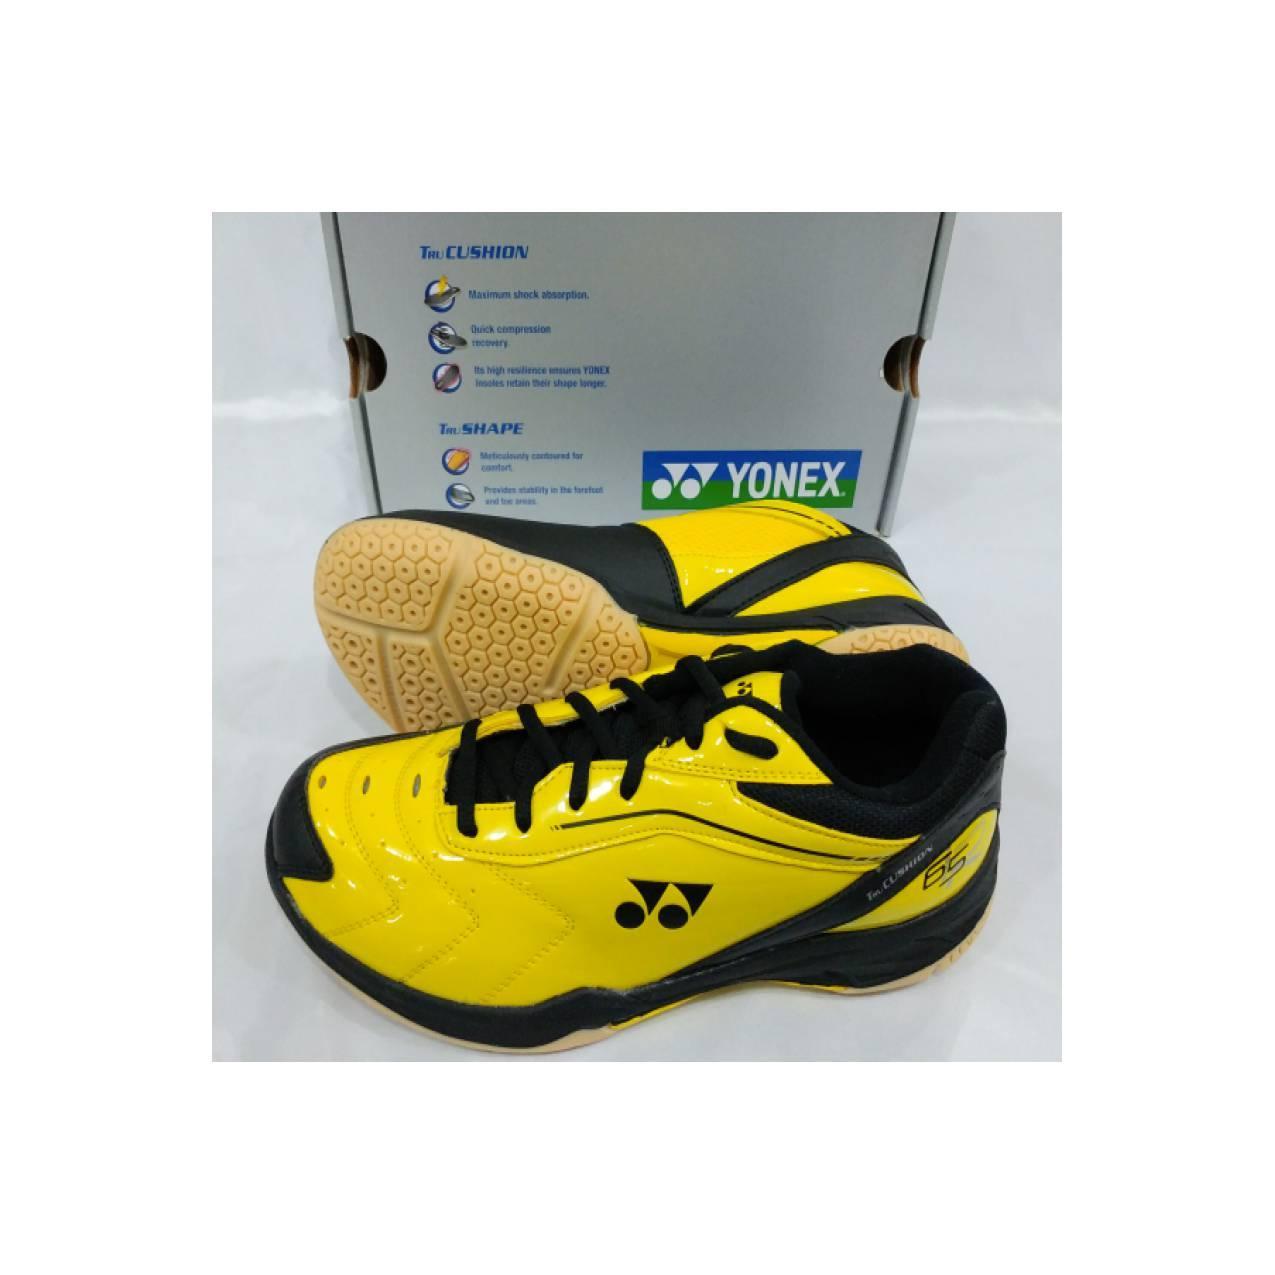 Sepatu Badminton Merk Yonex, Sepatu Bulu Tangkis Baru